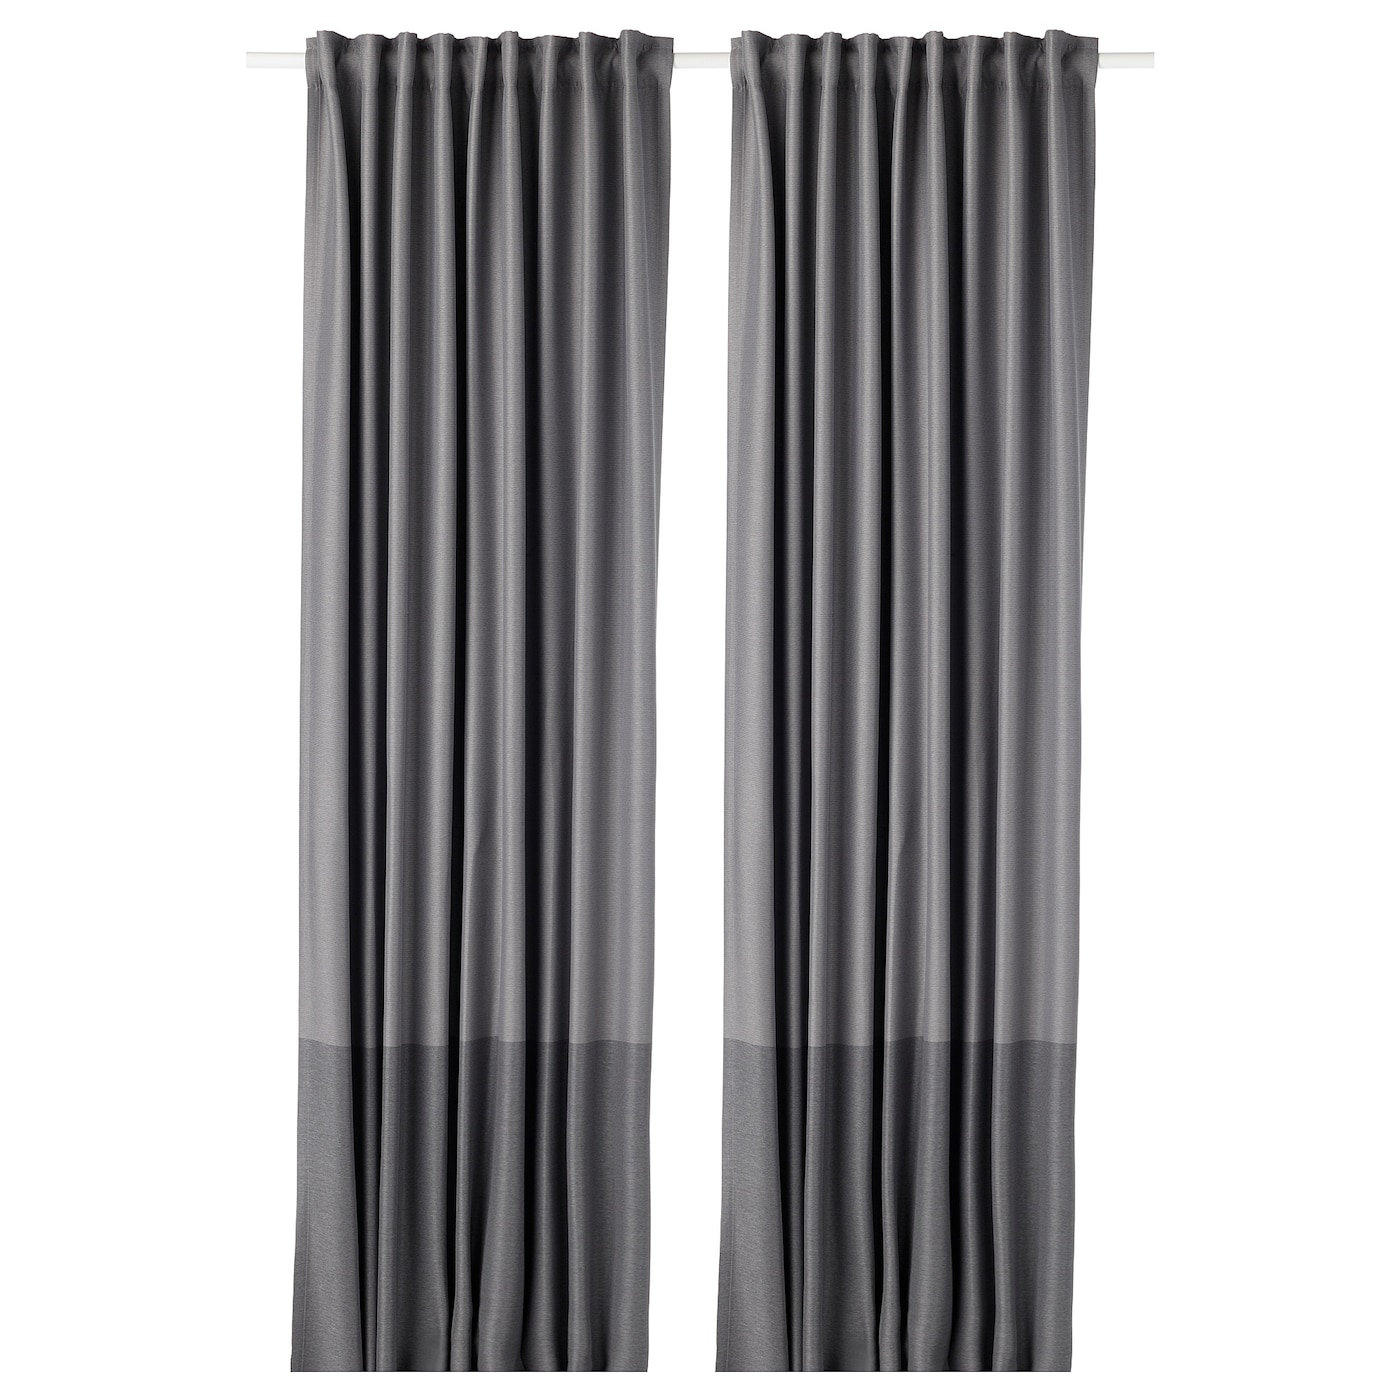 IKEA MAJGULL Vorhang 2er-SET Gardinenschals verdunkelt Vorhänge Gardinenpaar